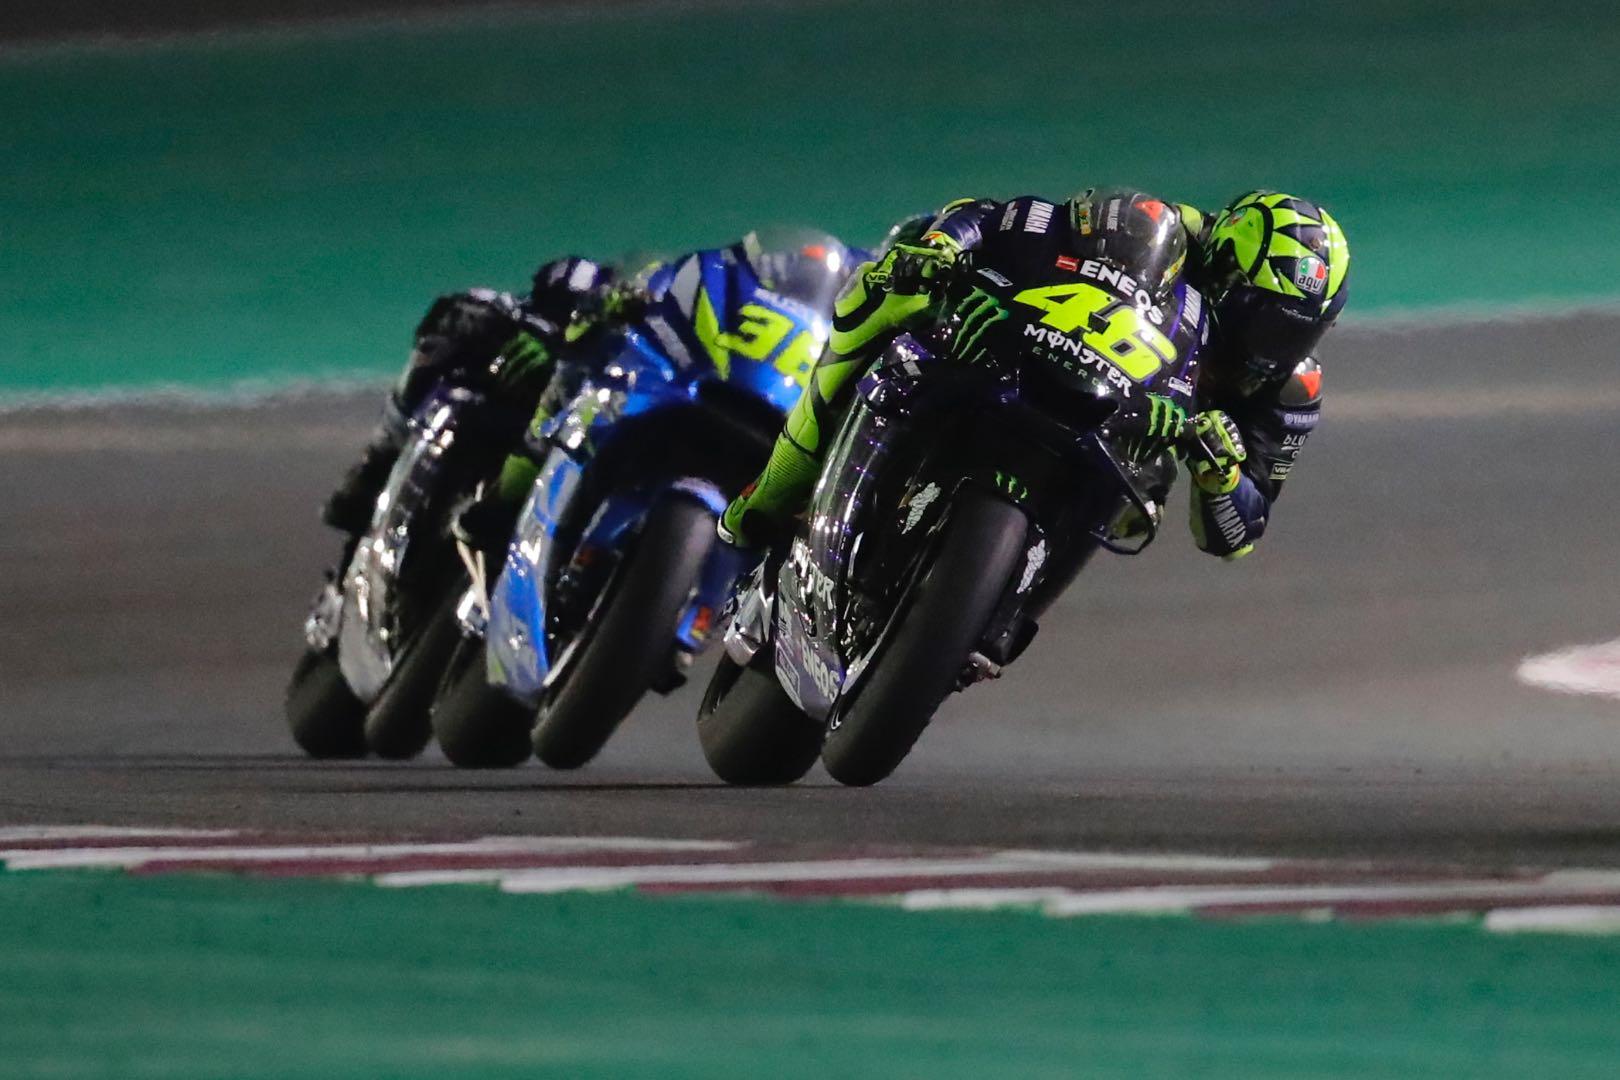 Valentino Rossi at 2019 Qatar MotoGP finish